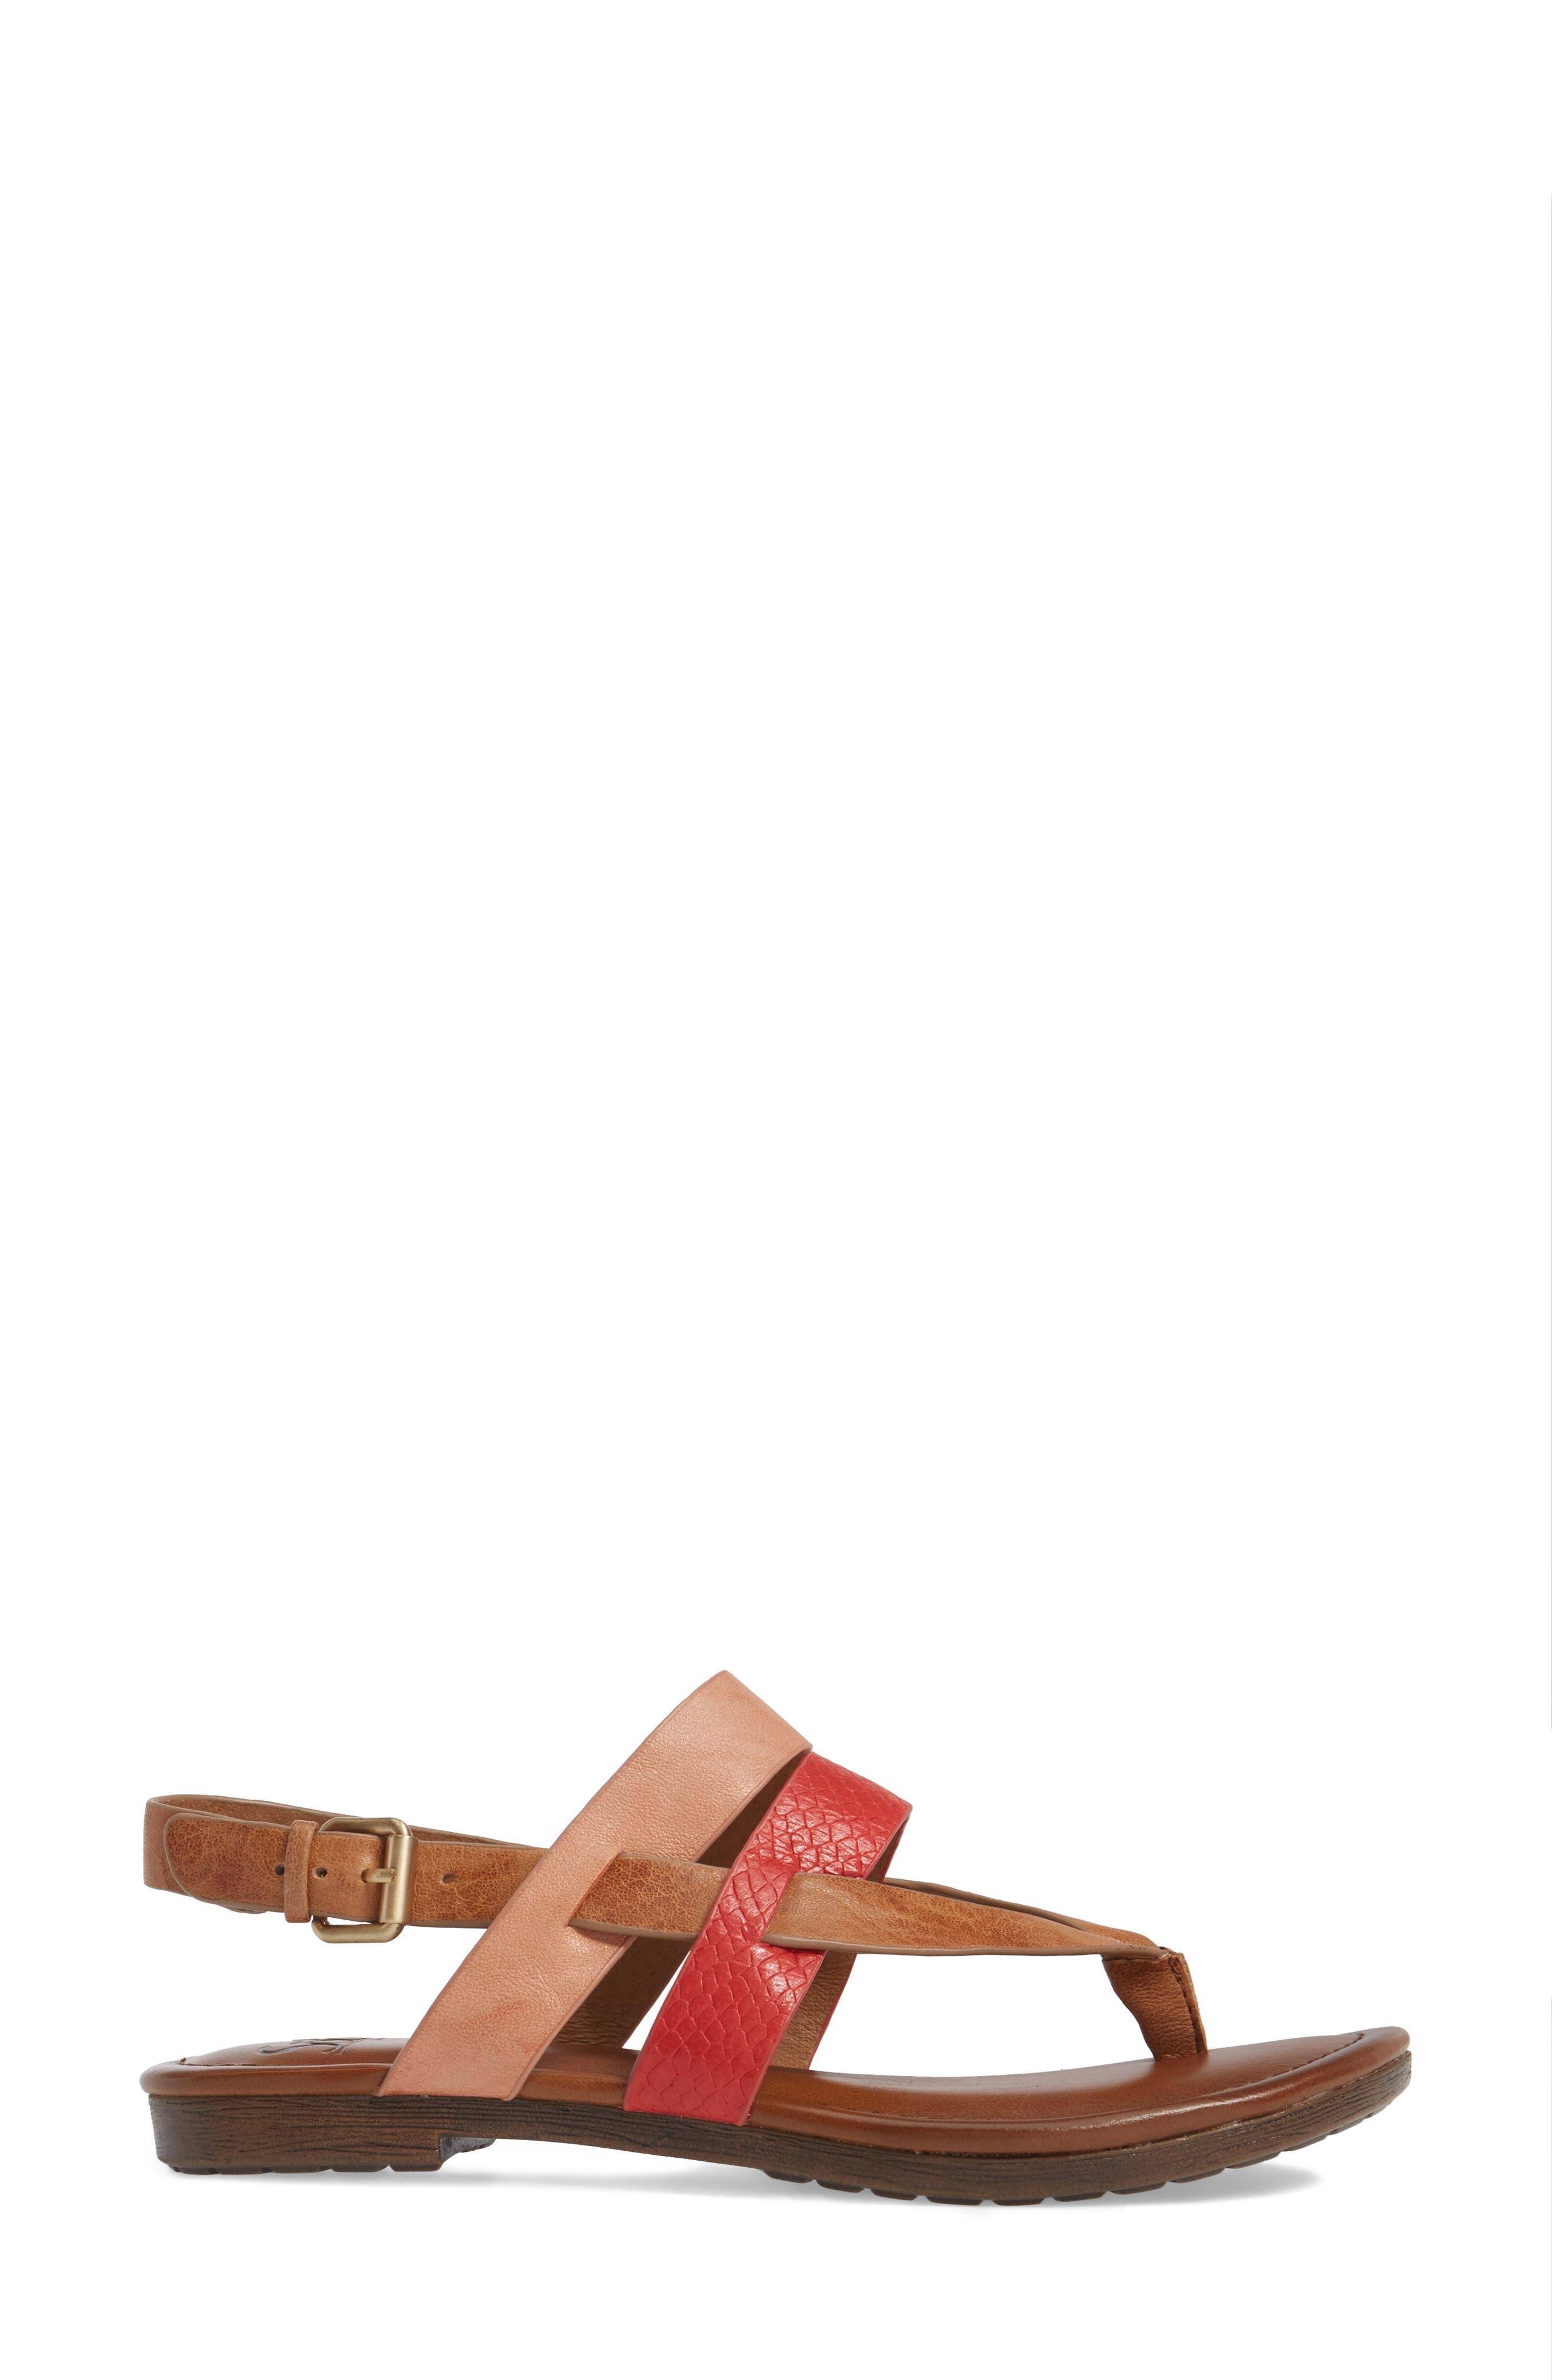 Alternate Image 3  - Söfft Bena Strappy Sandal (Women)